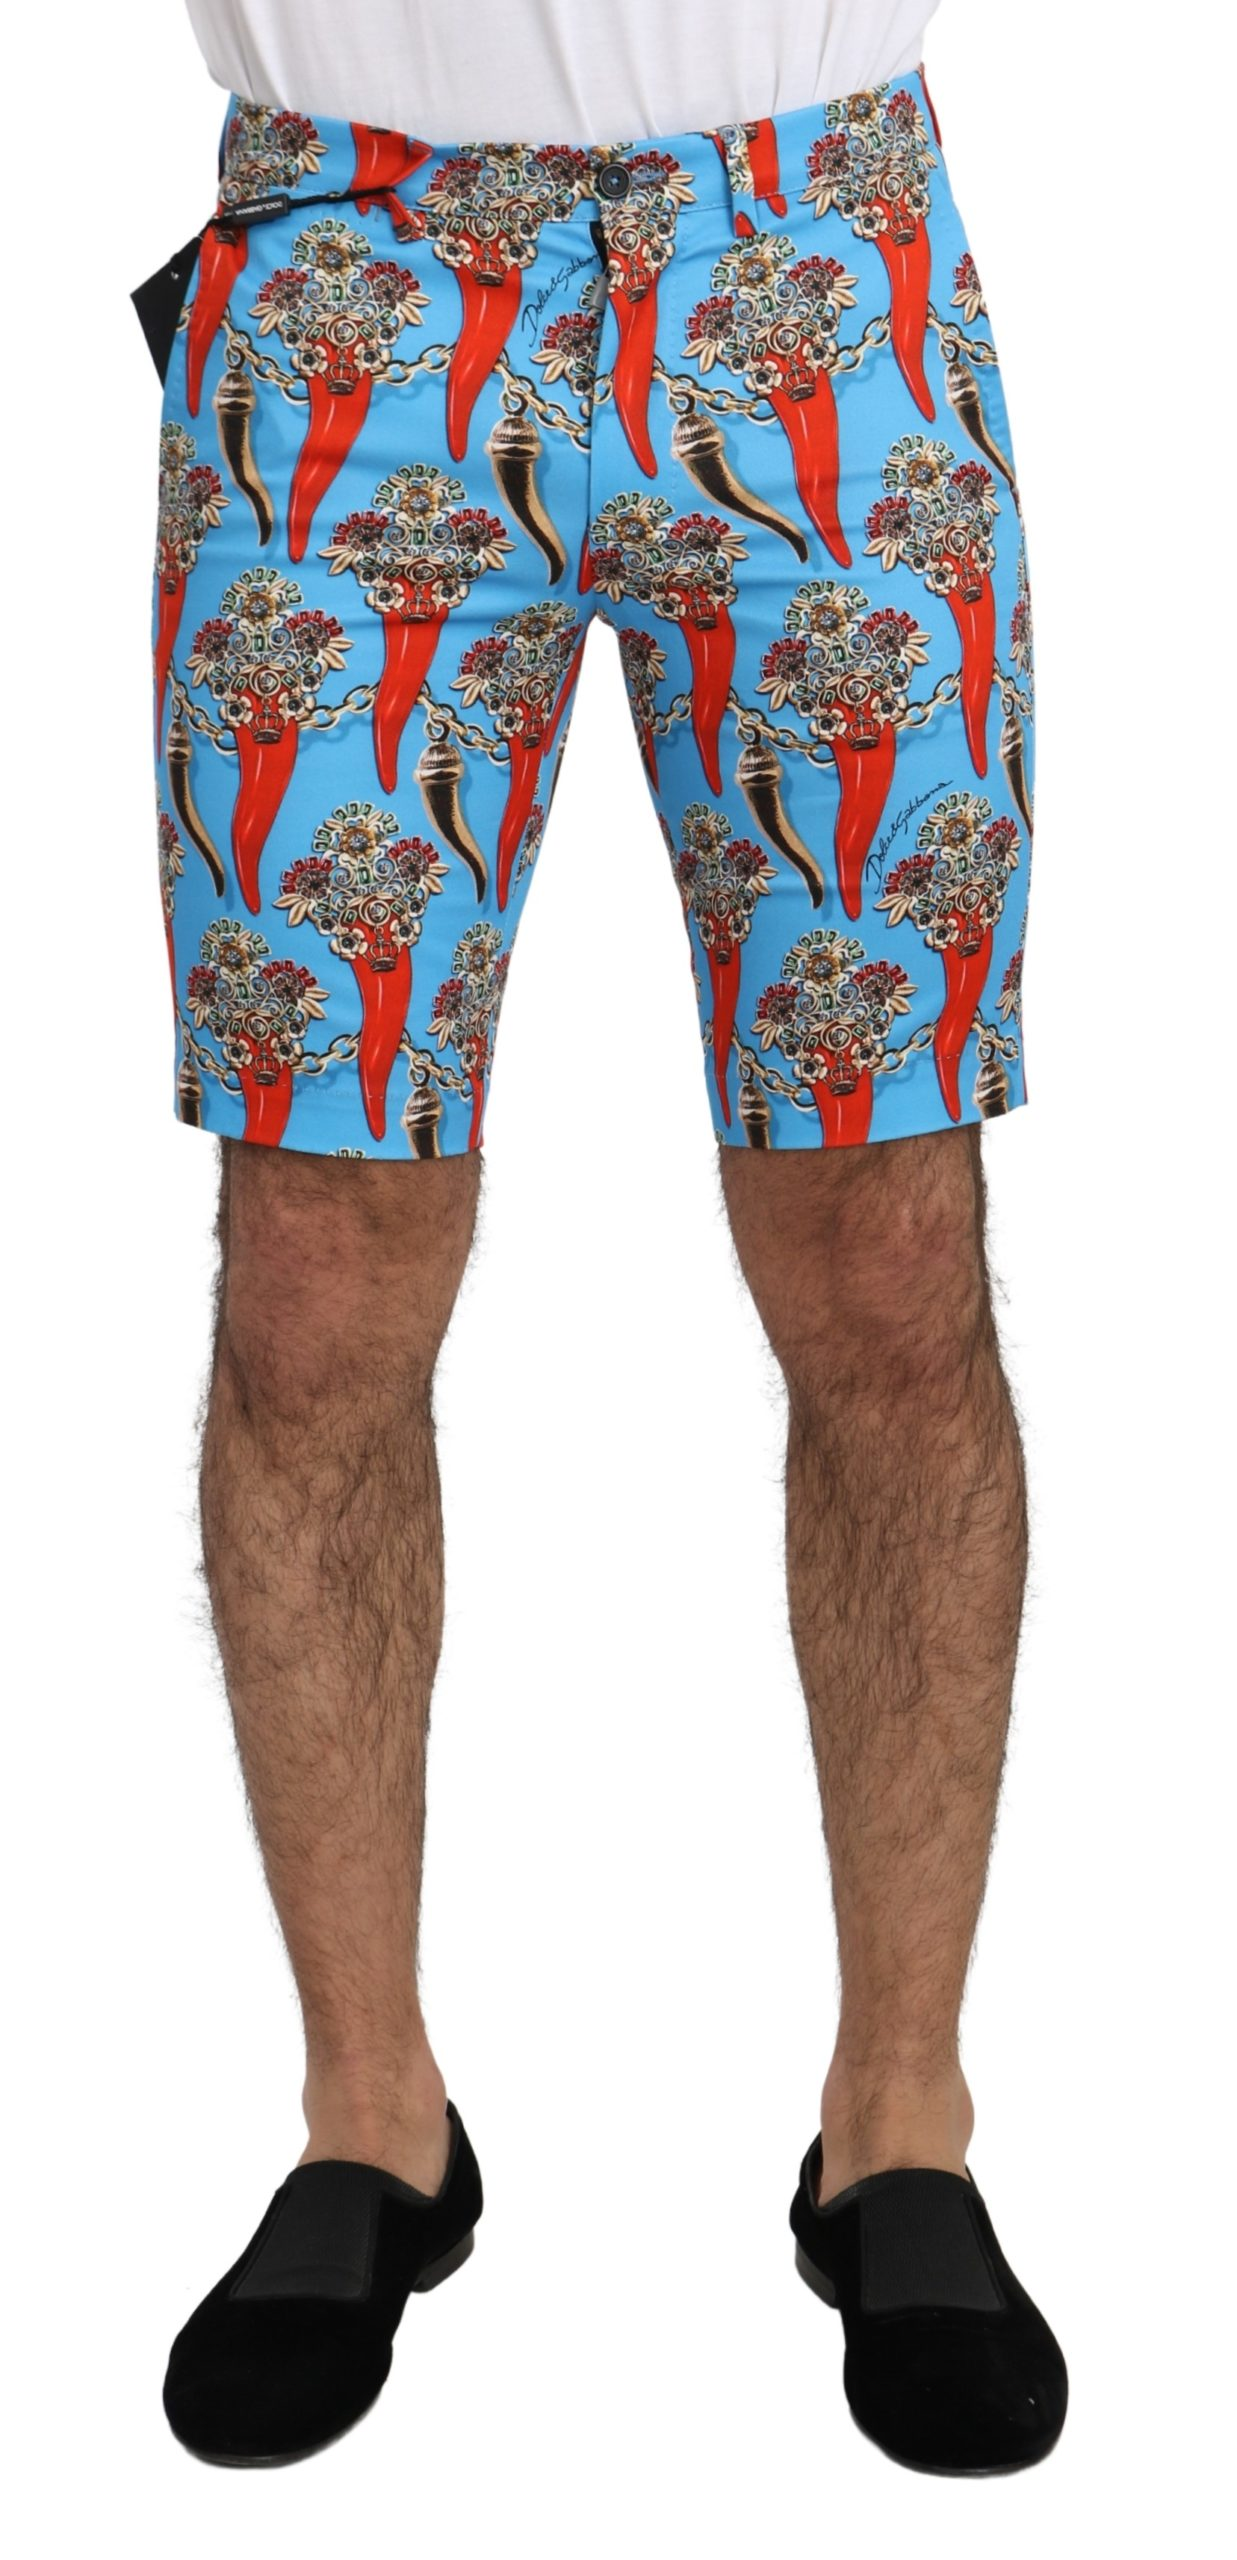 Dolce & Gabbana Men's Cotton Stretch Casual Royal Chili Shorts Blue PAN71284 - IT44   XS